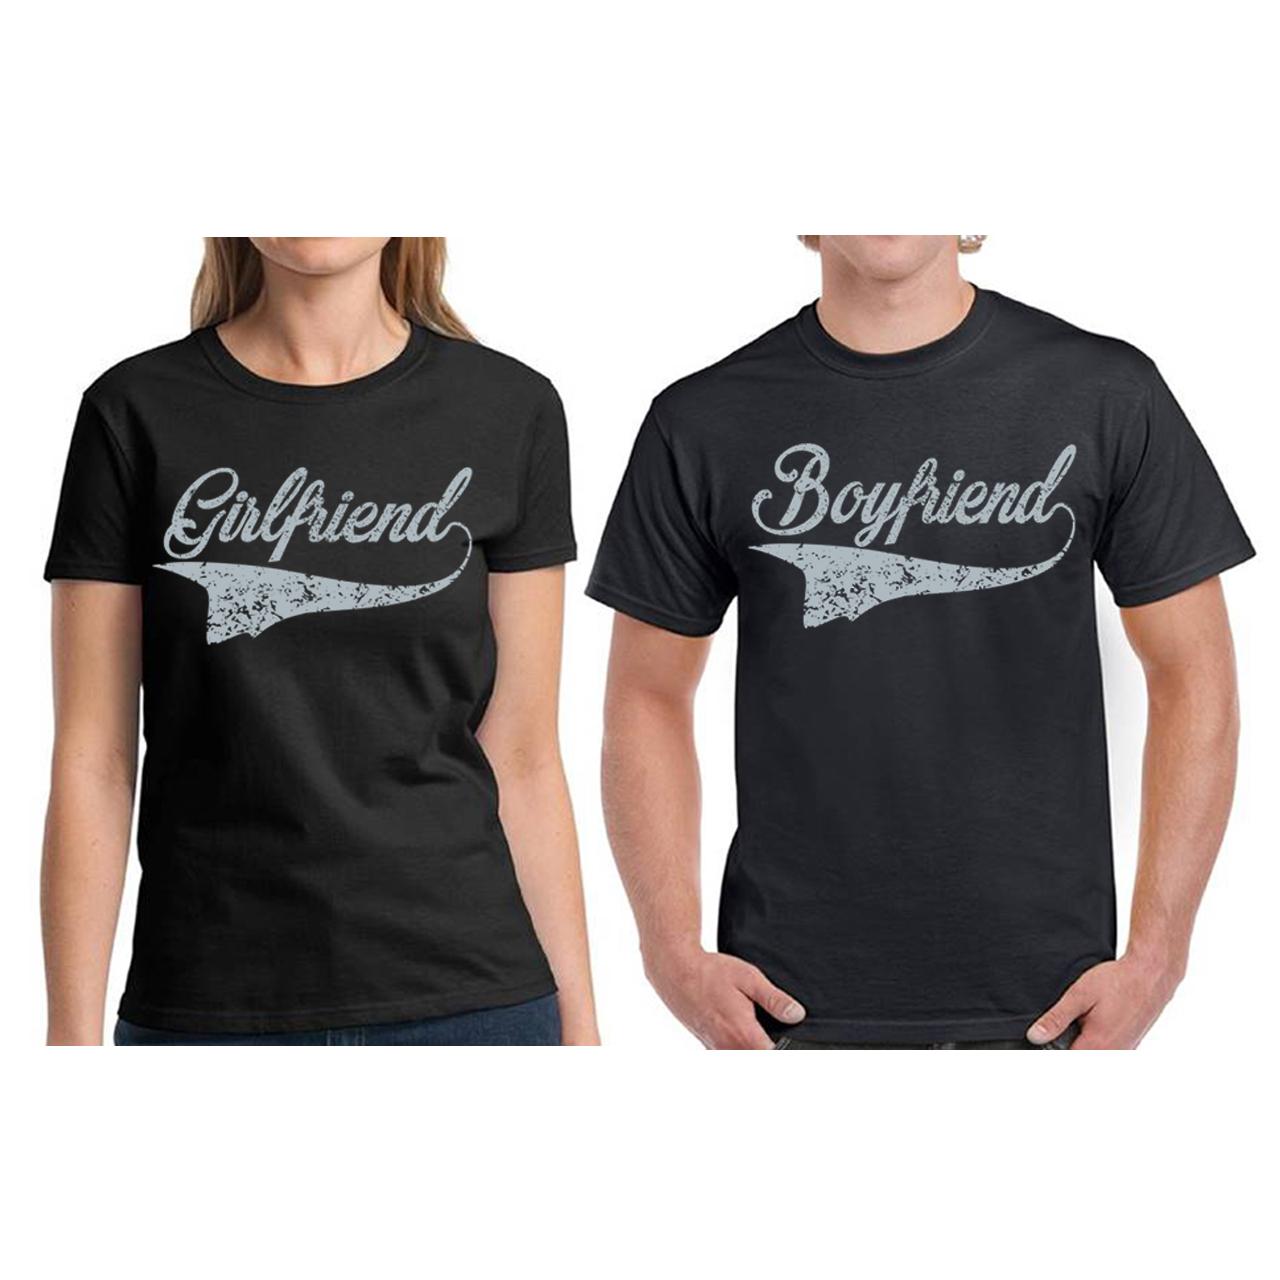 matching boyfriend girlfriends shirts couples shirts. Black Bedroom Furniture Sets. Home Design Ideas